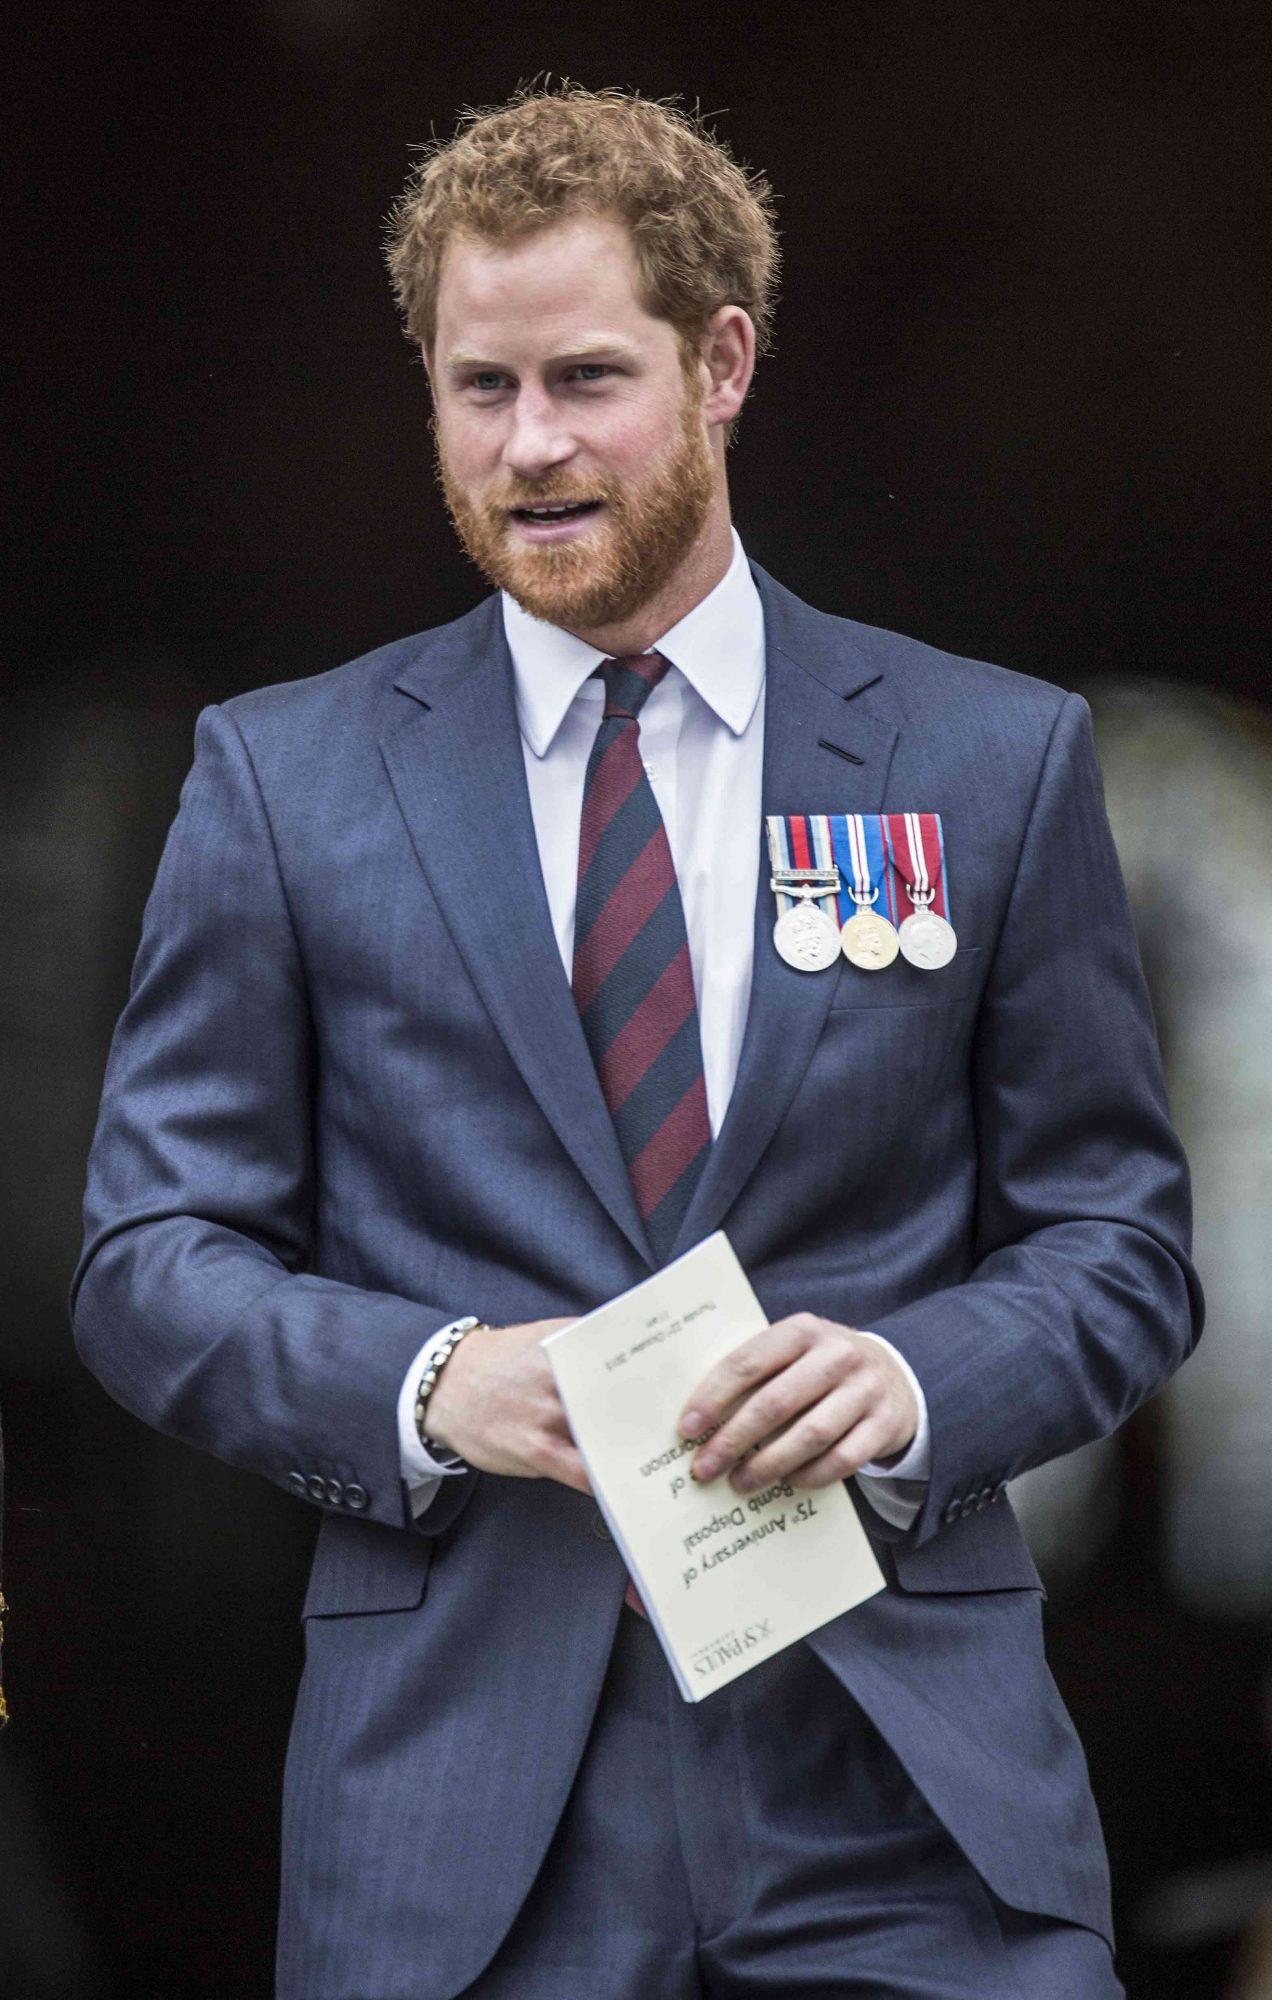 Prince_Harry1.jpg